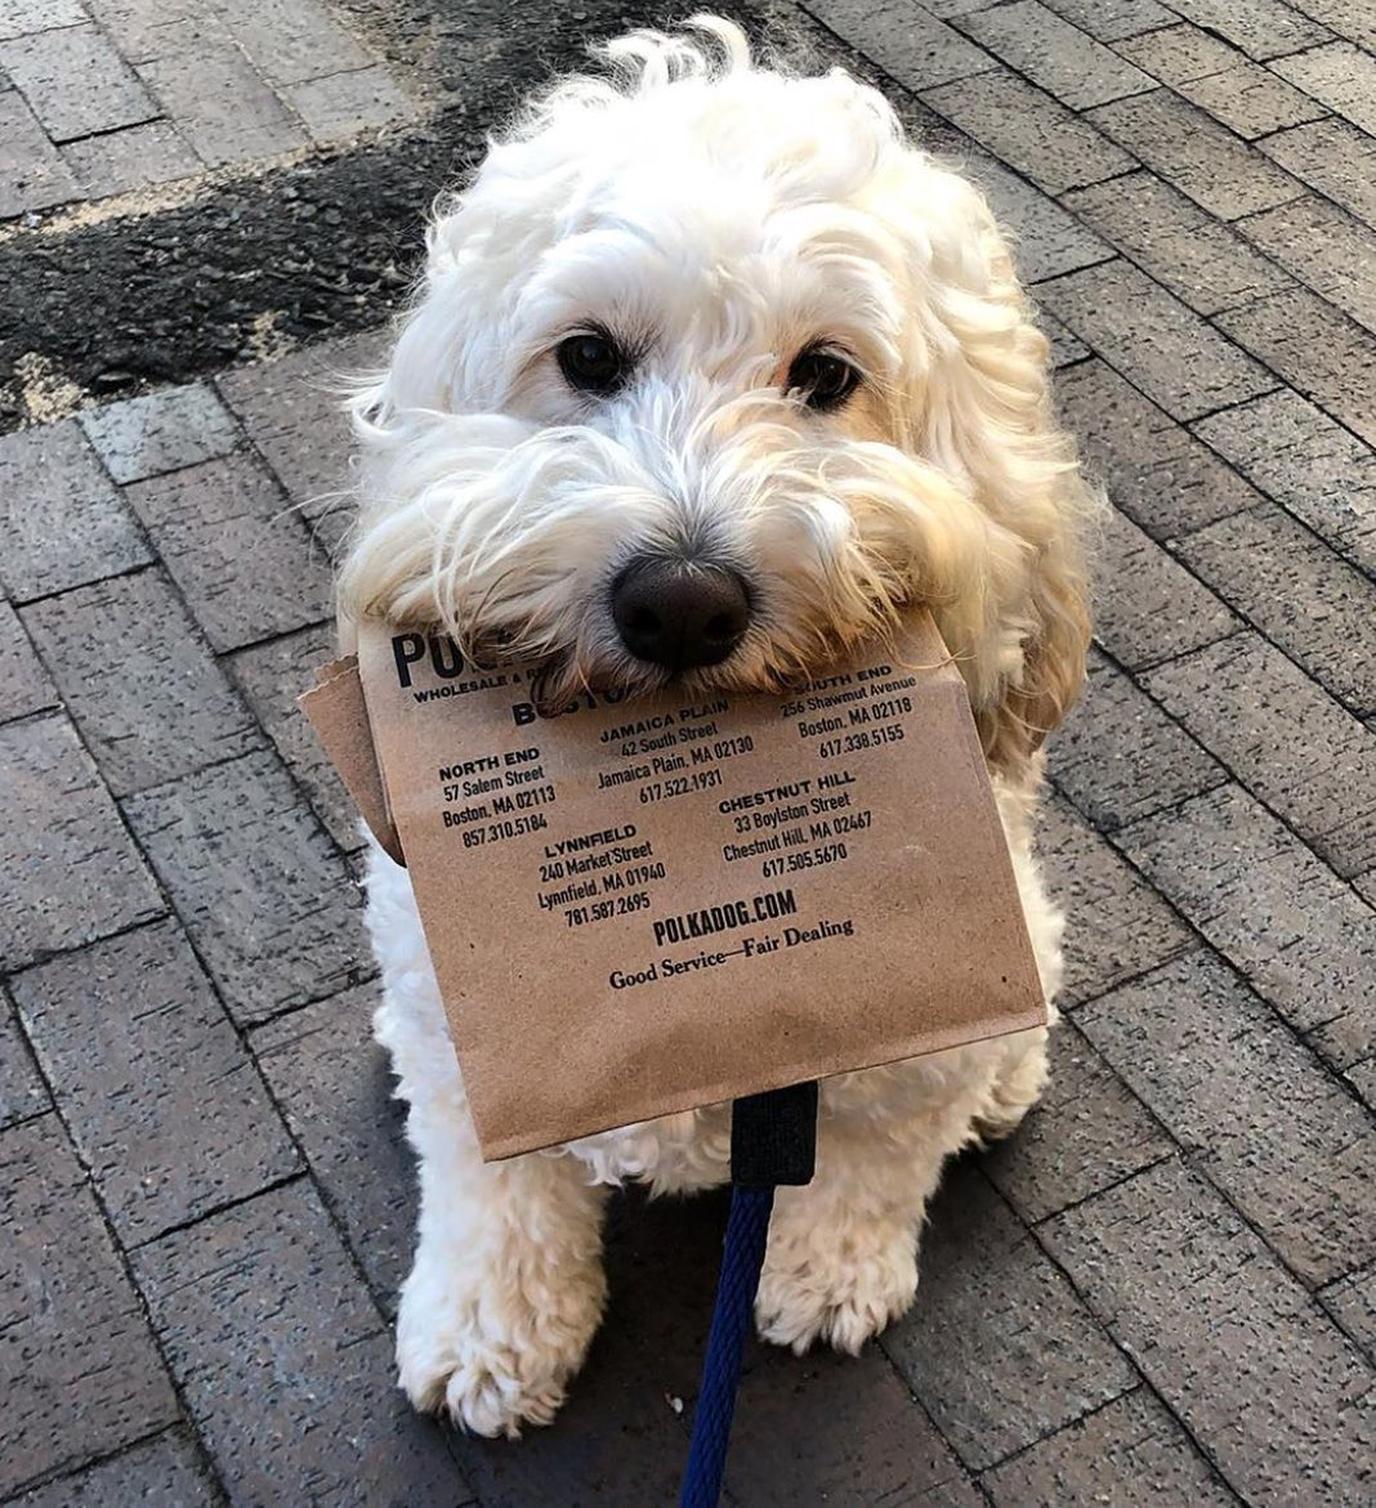 Polkadog Bakery is a neighborhood spot for seasonal dog treats in the Boston area.